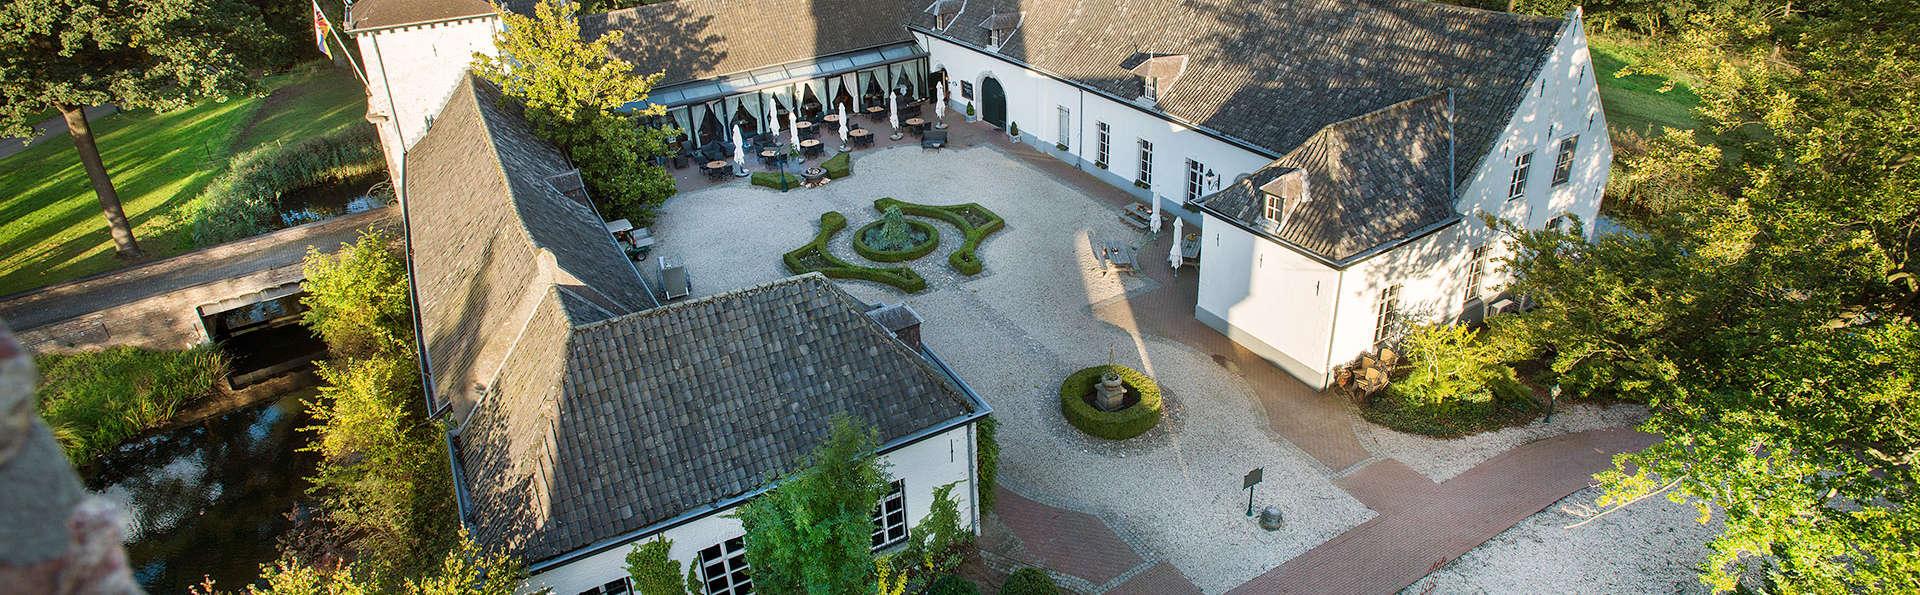 Landgoed Kasteel Daelenbroeck  - EDIT_voorburcht-vanuit-nieuwe-toren.jpg